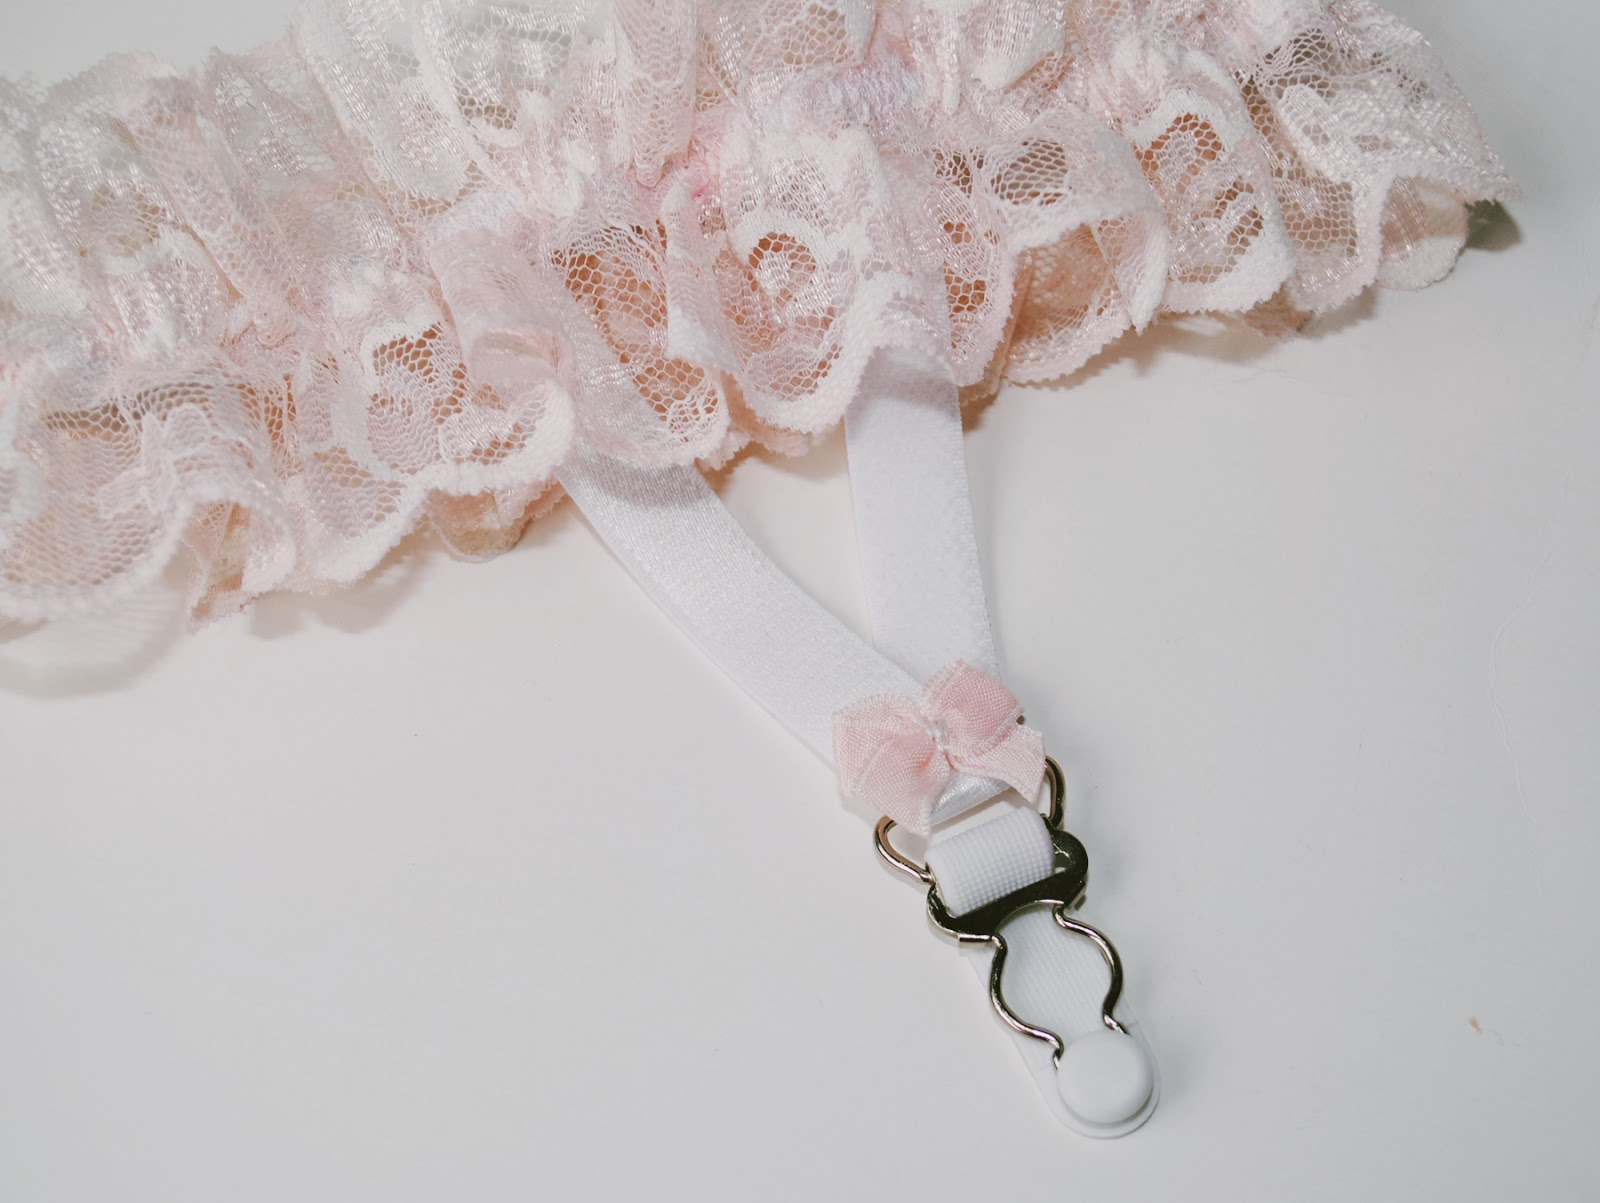 Handmade pastel lace garter.